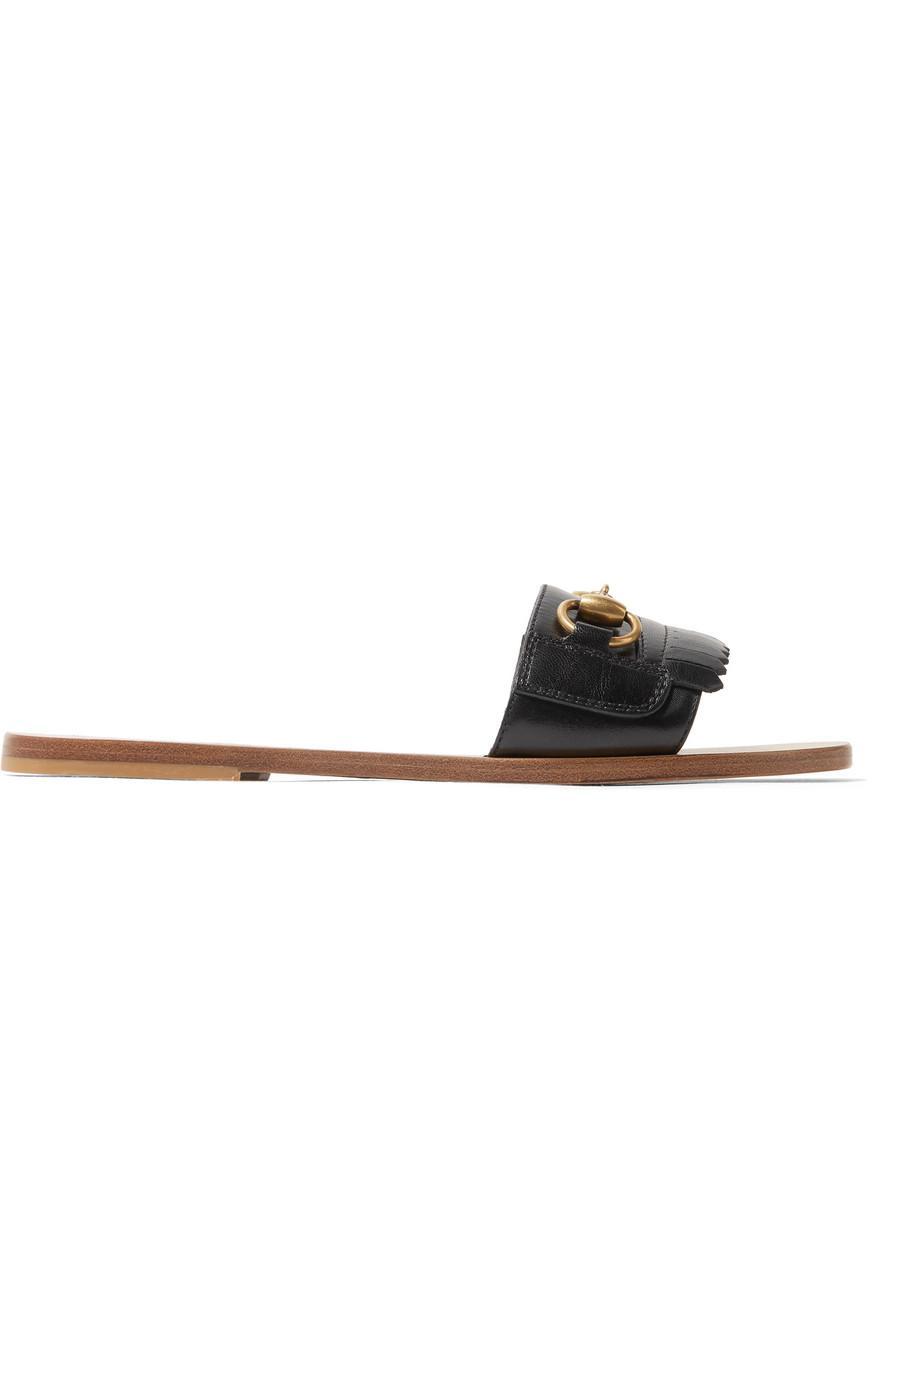 Varadero Horsebit Fringed Leather Sandals Gucci OlnwYNG4V